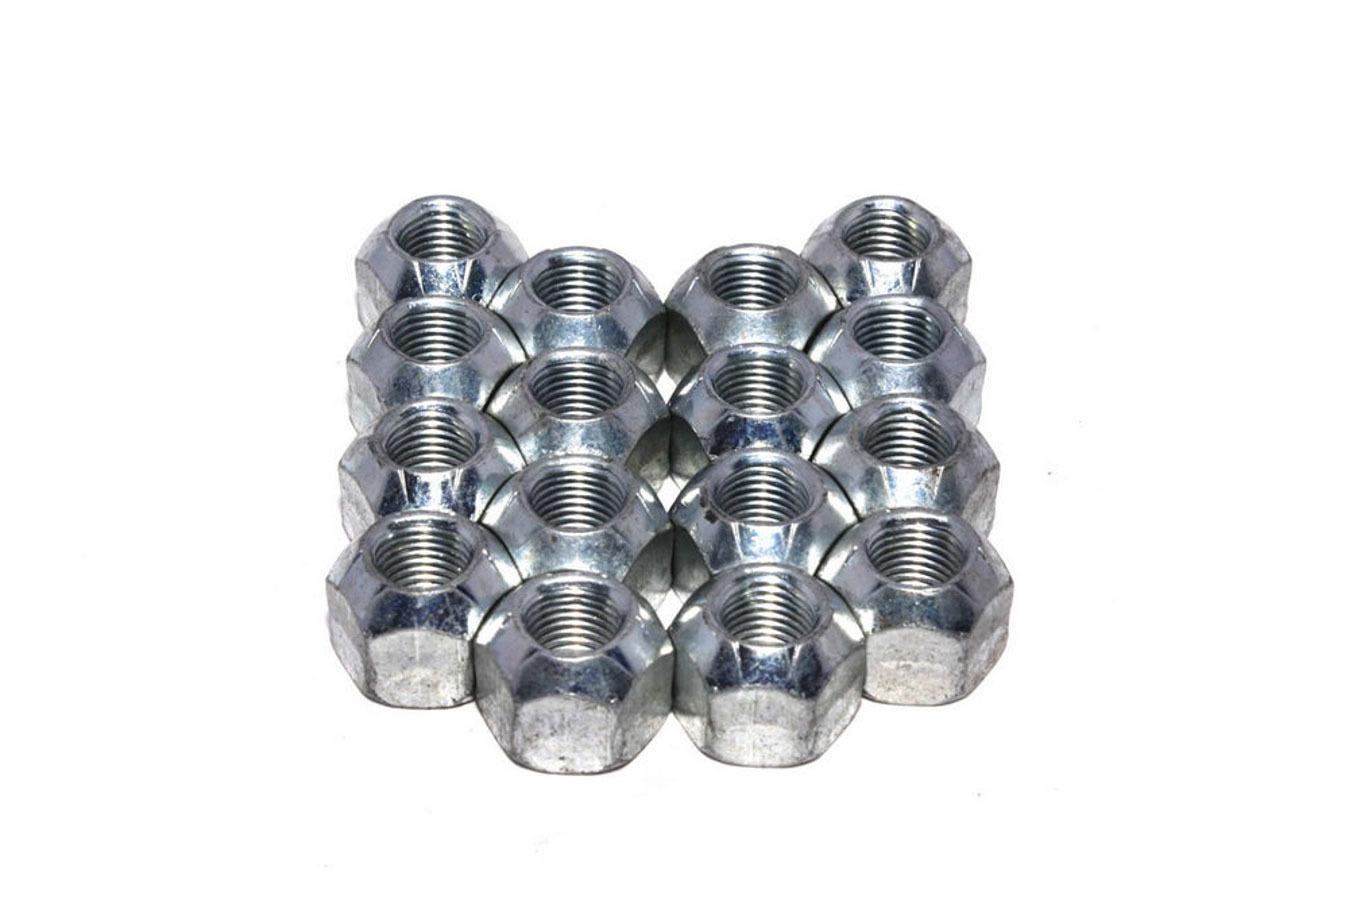 Comp Cams 1400N-16 Rocker Arm Nut, Magnum, 3/8-24 in Thread, Steel, Zinc Oxide, Set of 16